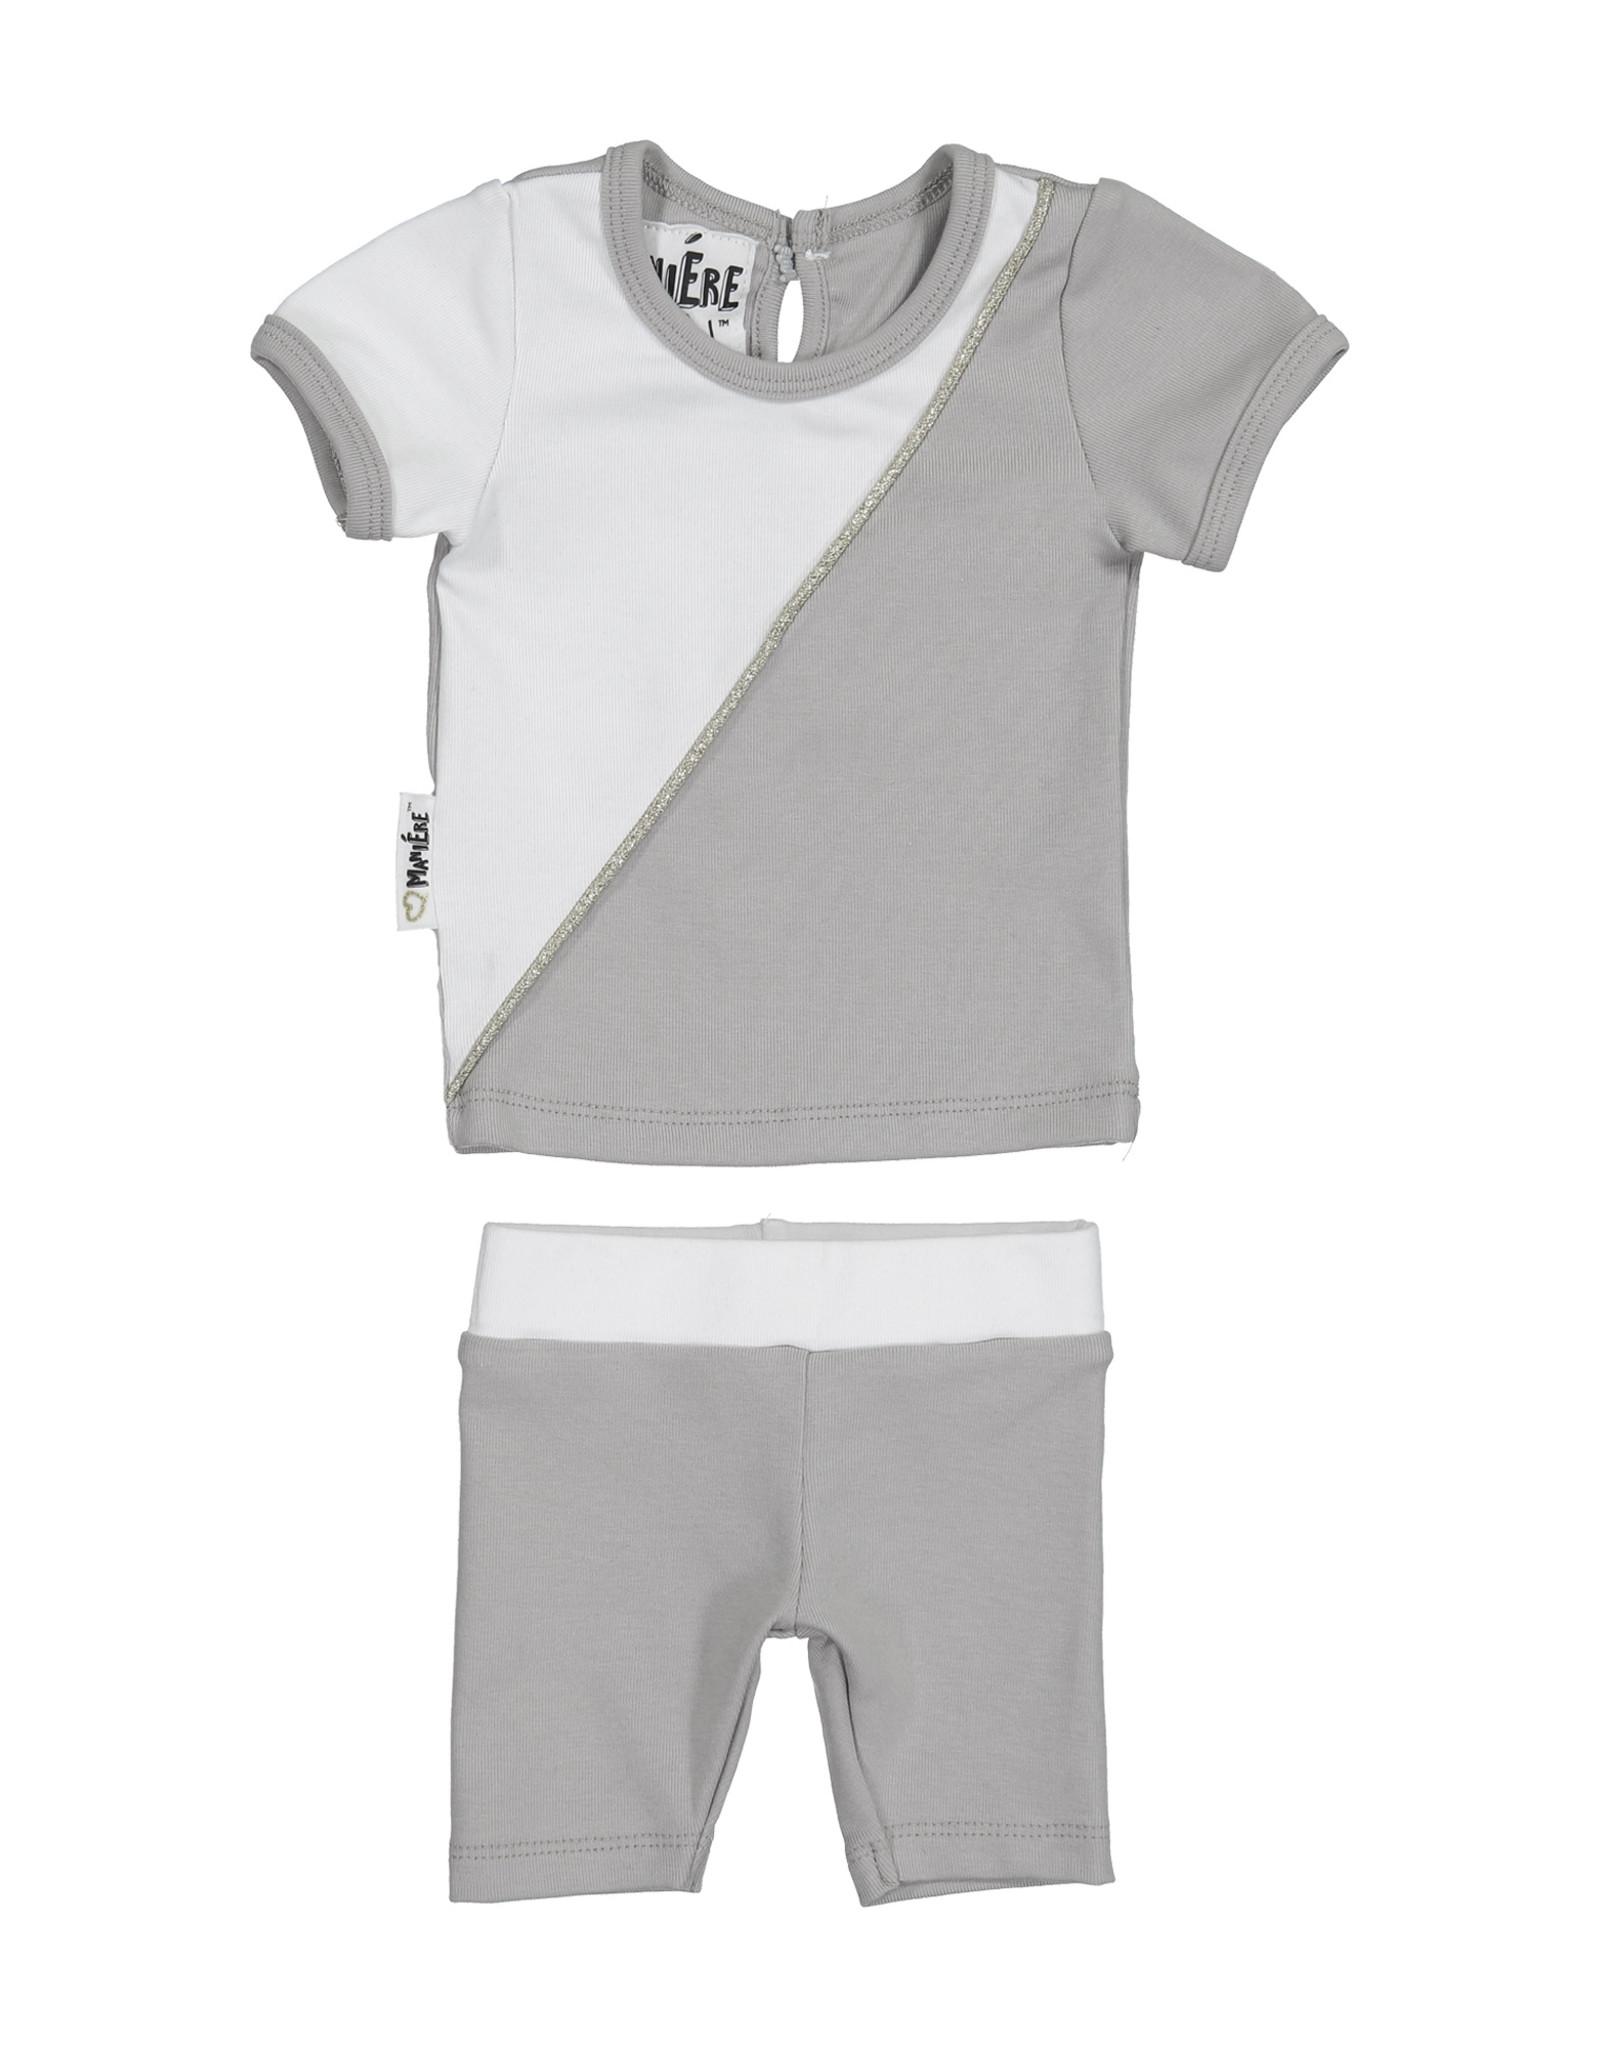 Maniere Maniere Diagonal Cording Set (Short Sleeve Top/Shorts)